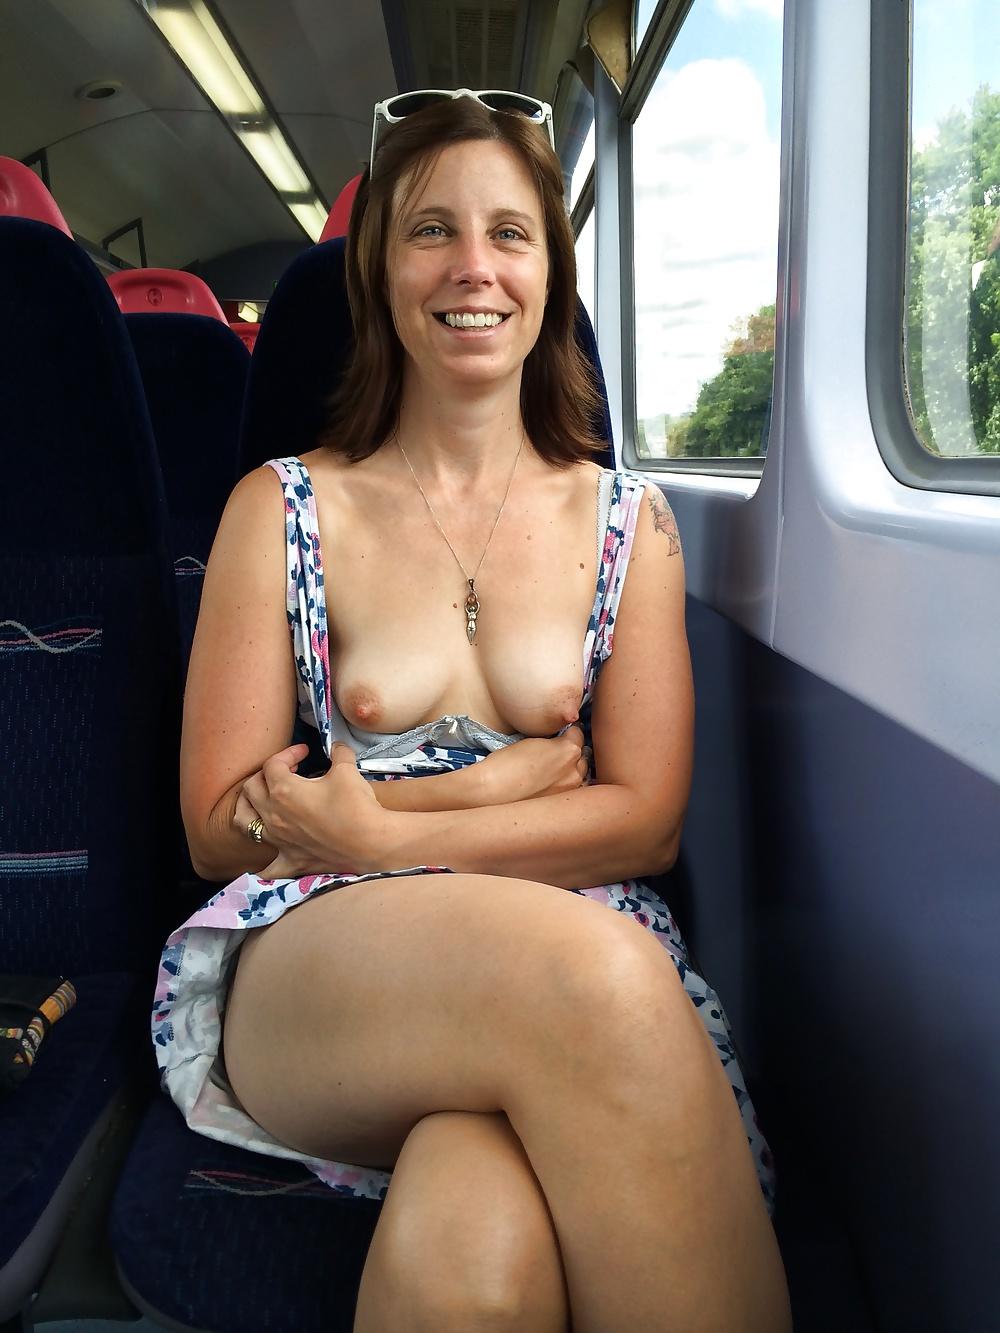 Flashing boobs in bus